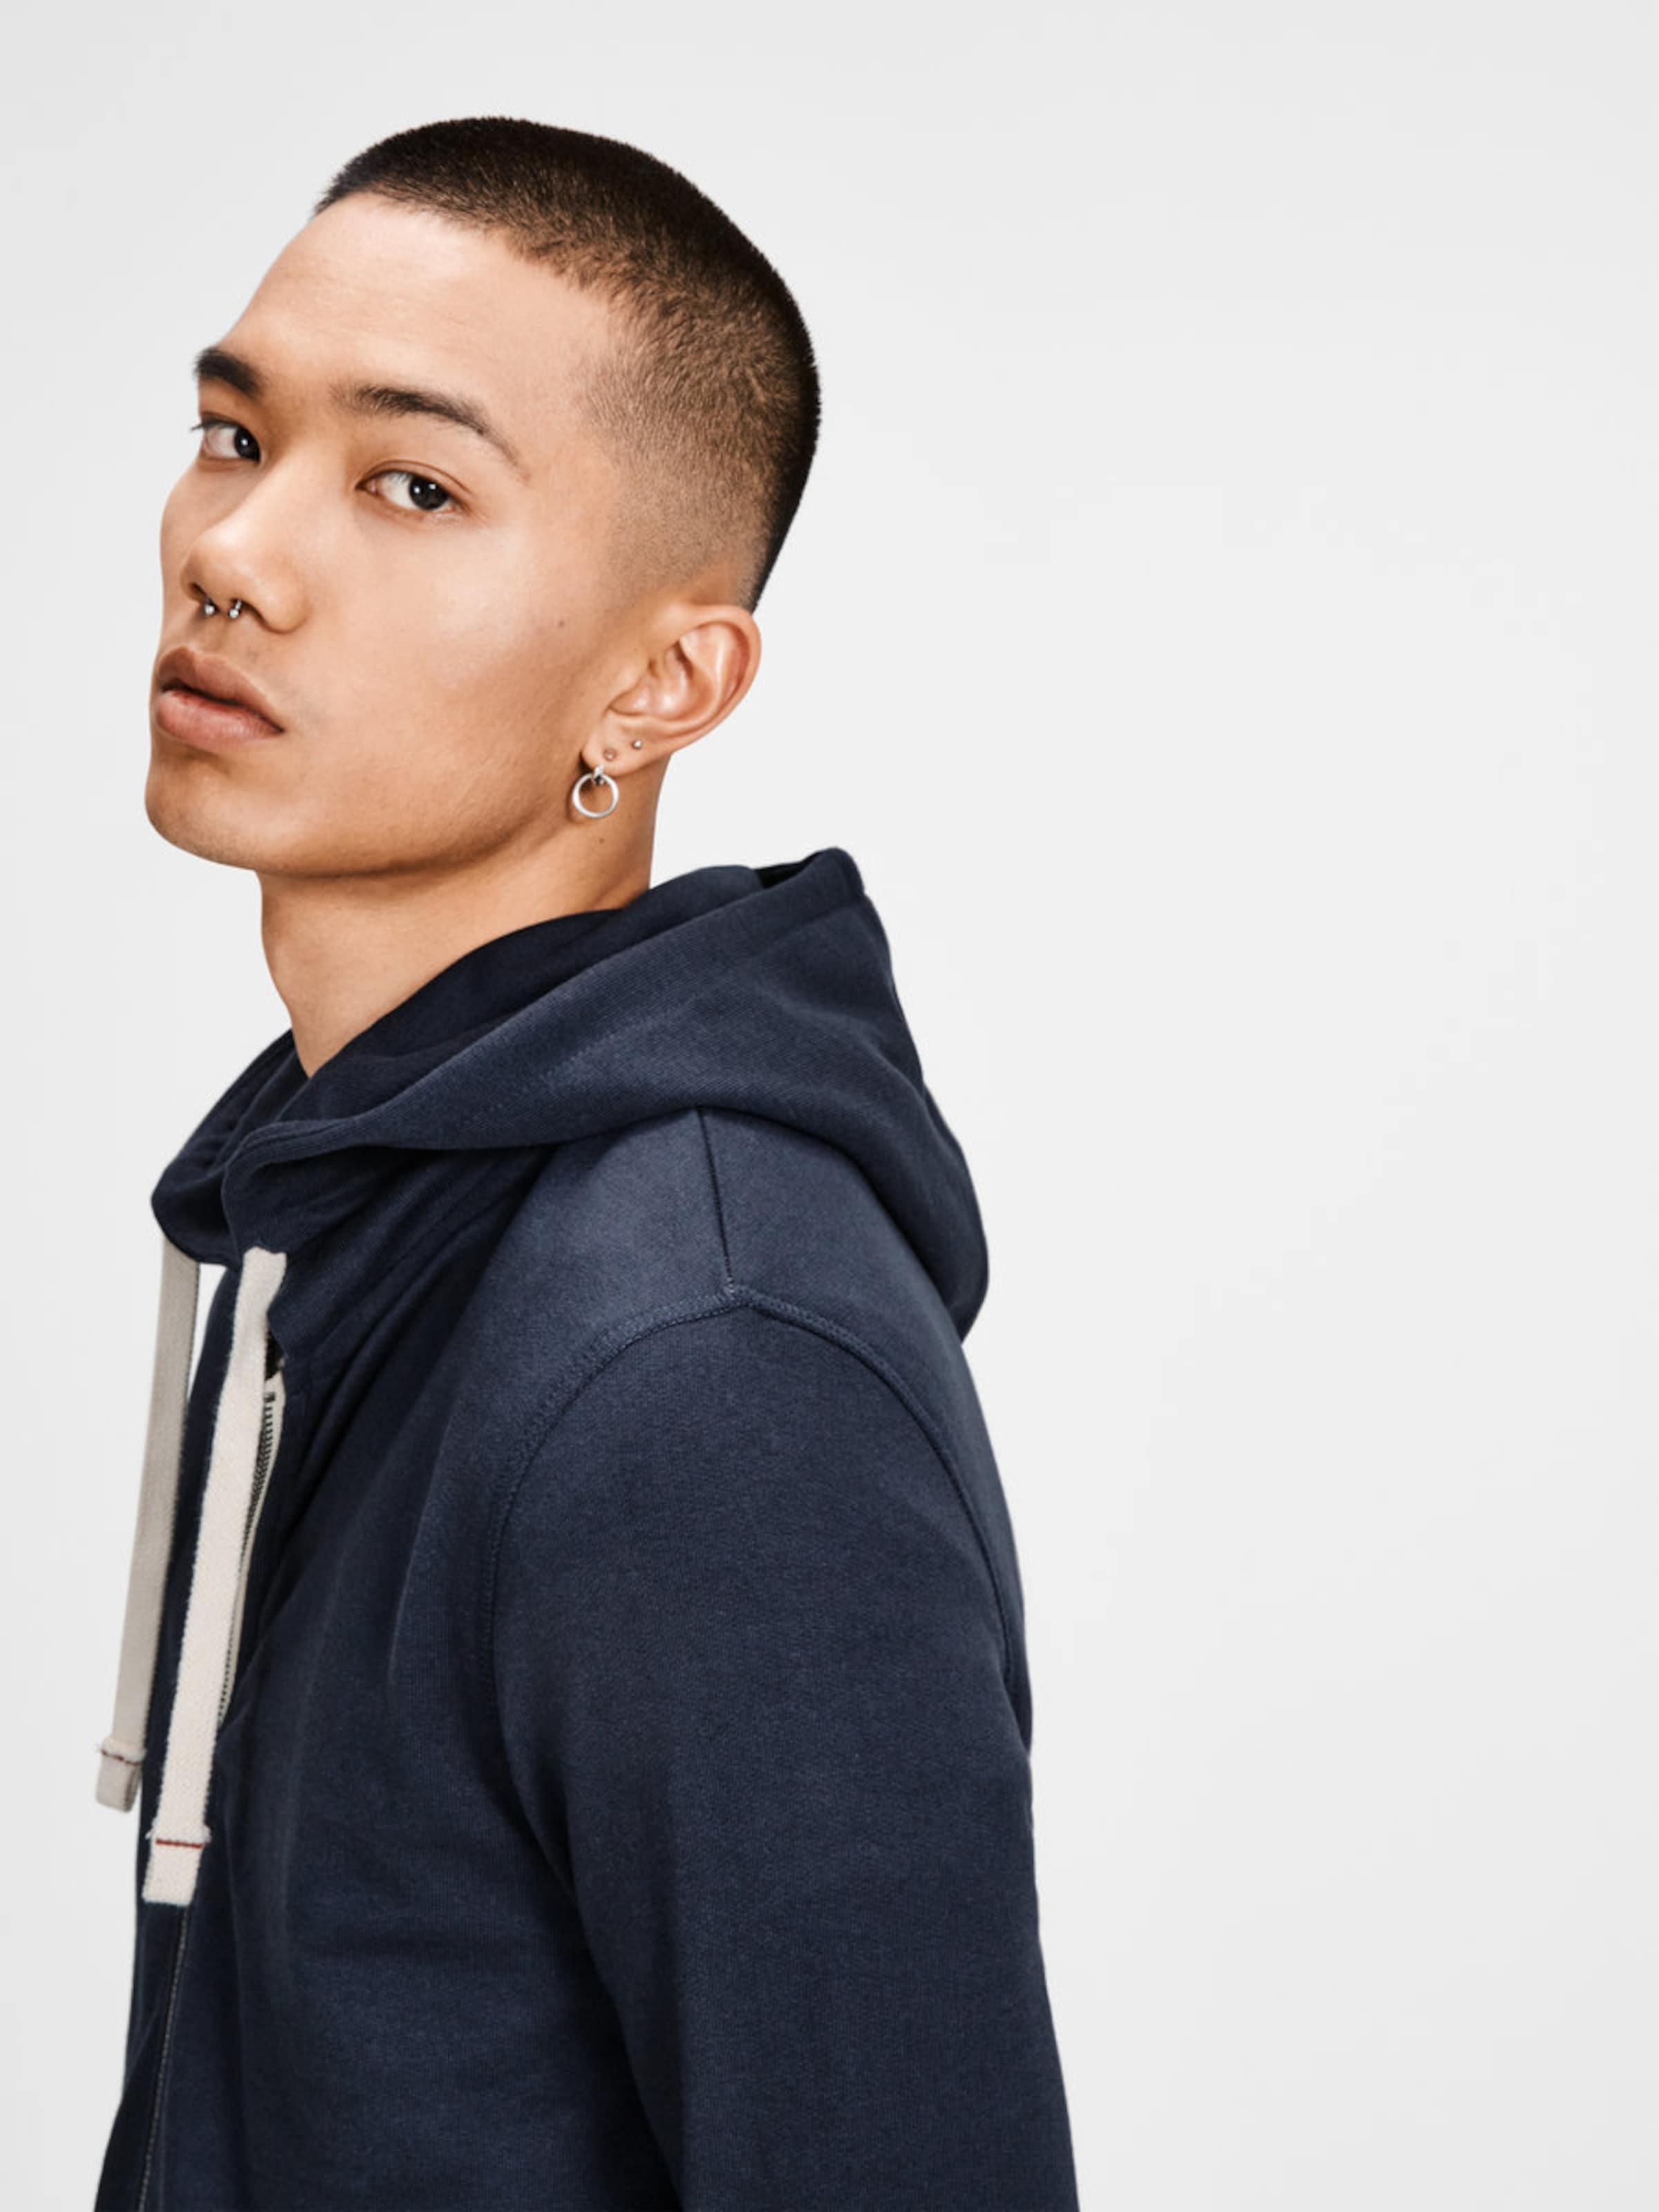 JACK & JONES Sweatshirt Verkauf Besten Verkaufs pBxG6